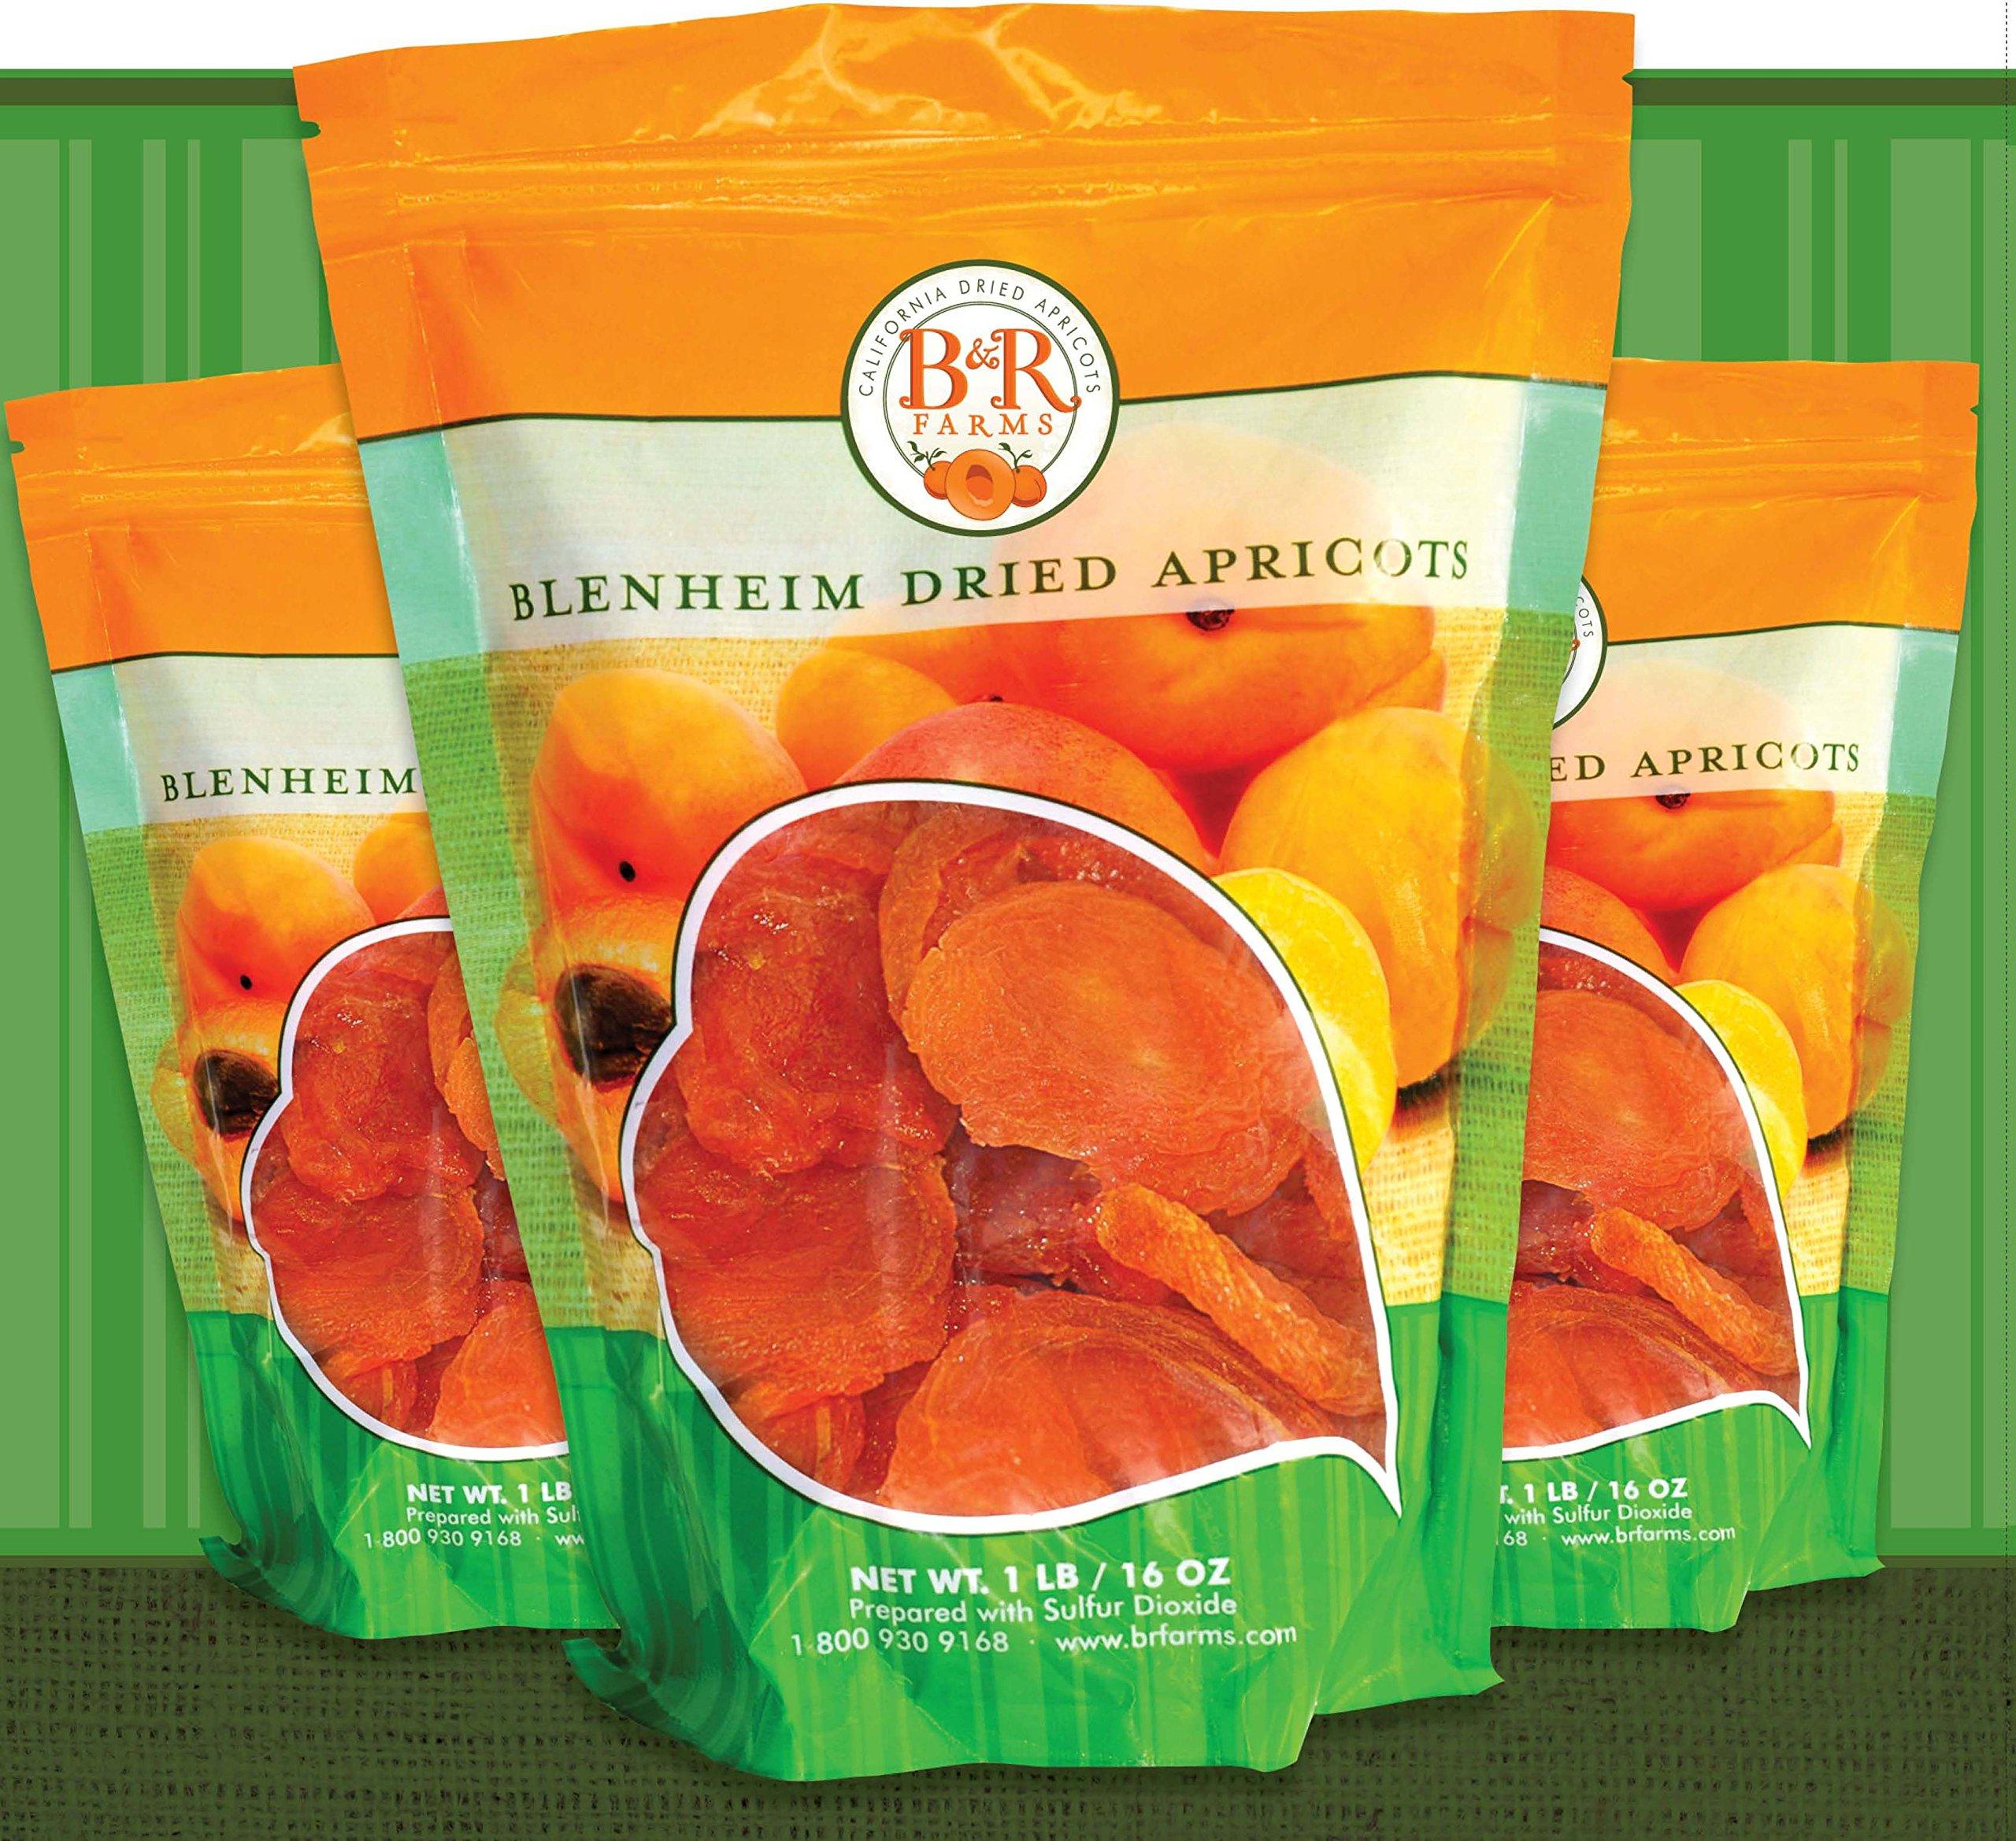 B&R Farms Royal Medallions 4 lbs (resealable bag) by B & R Farms (Image #1)